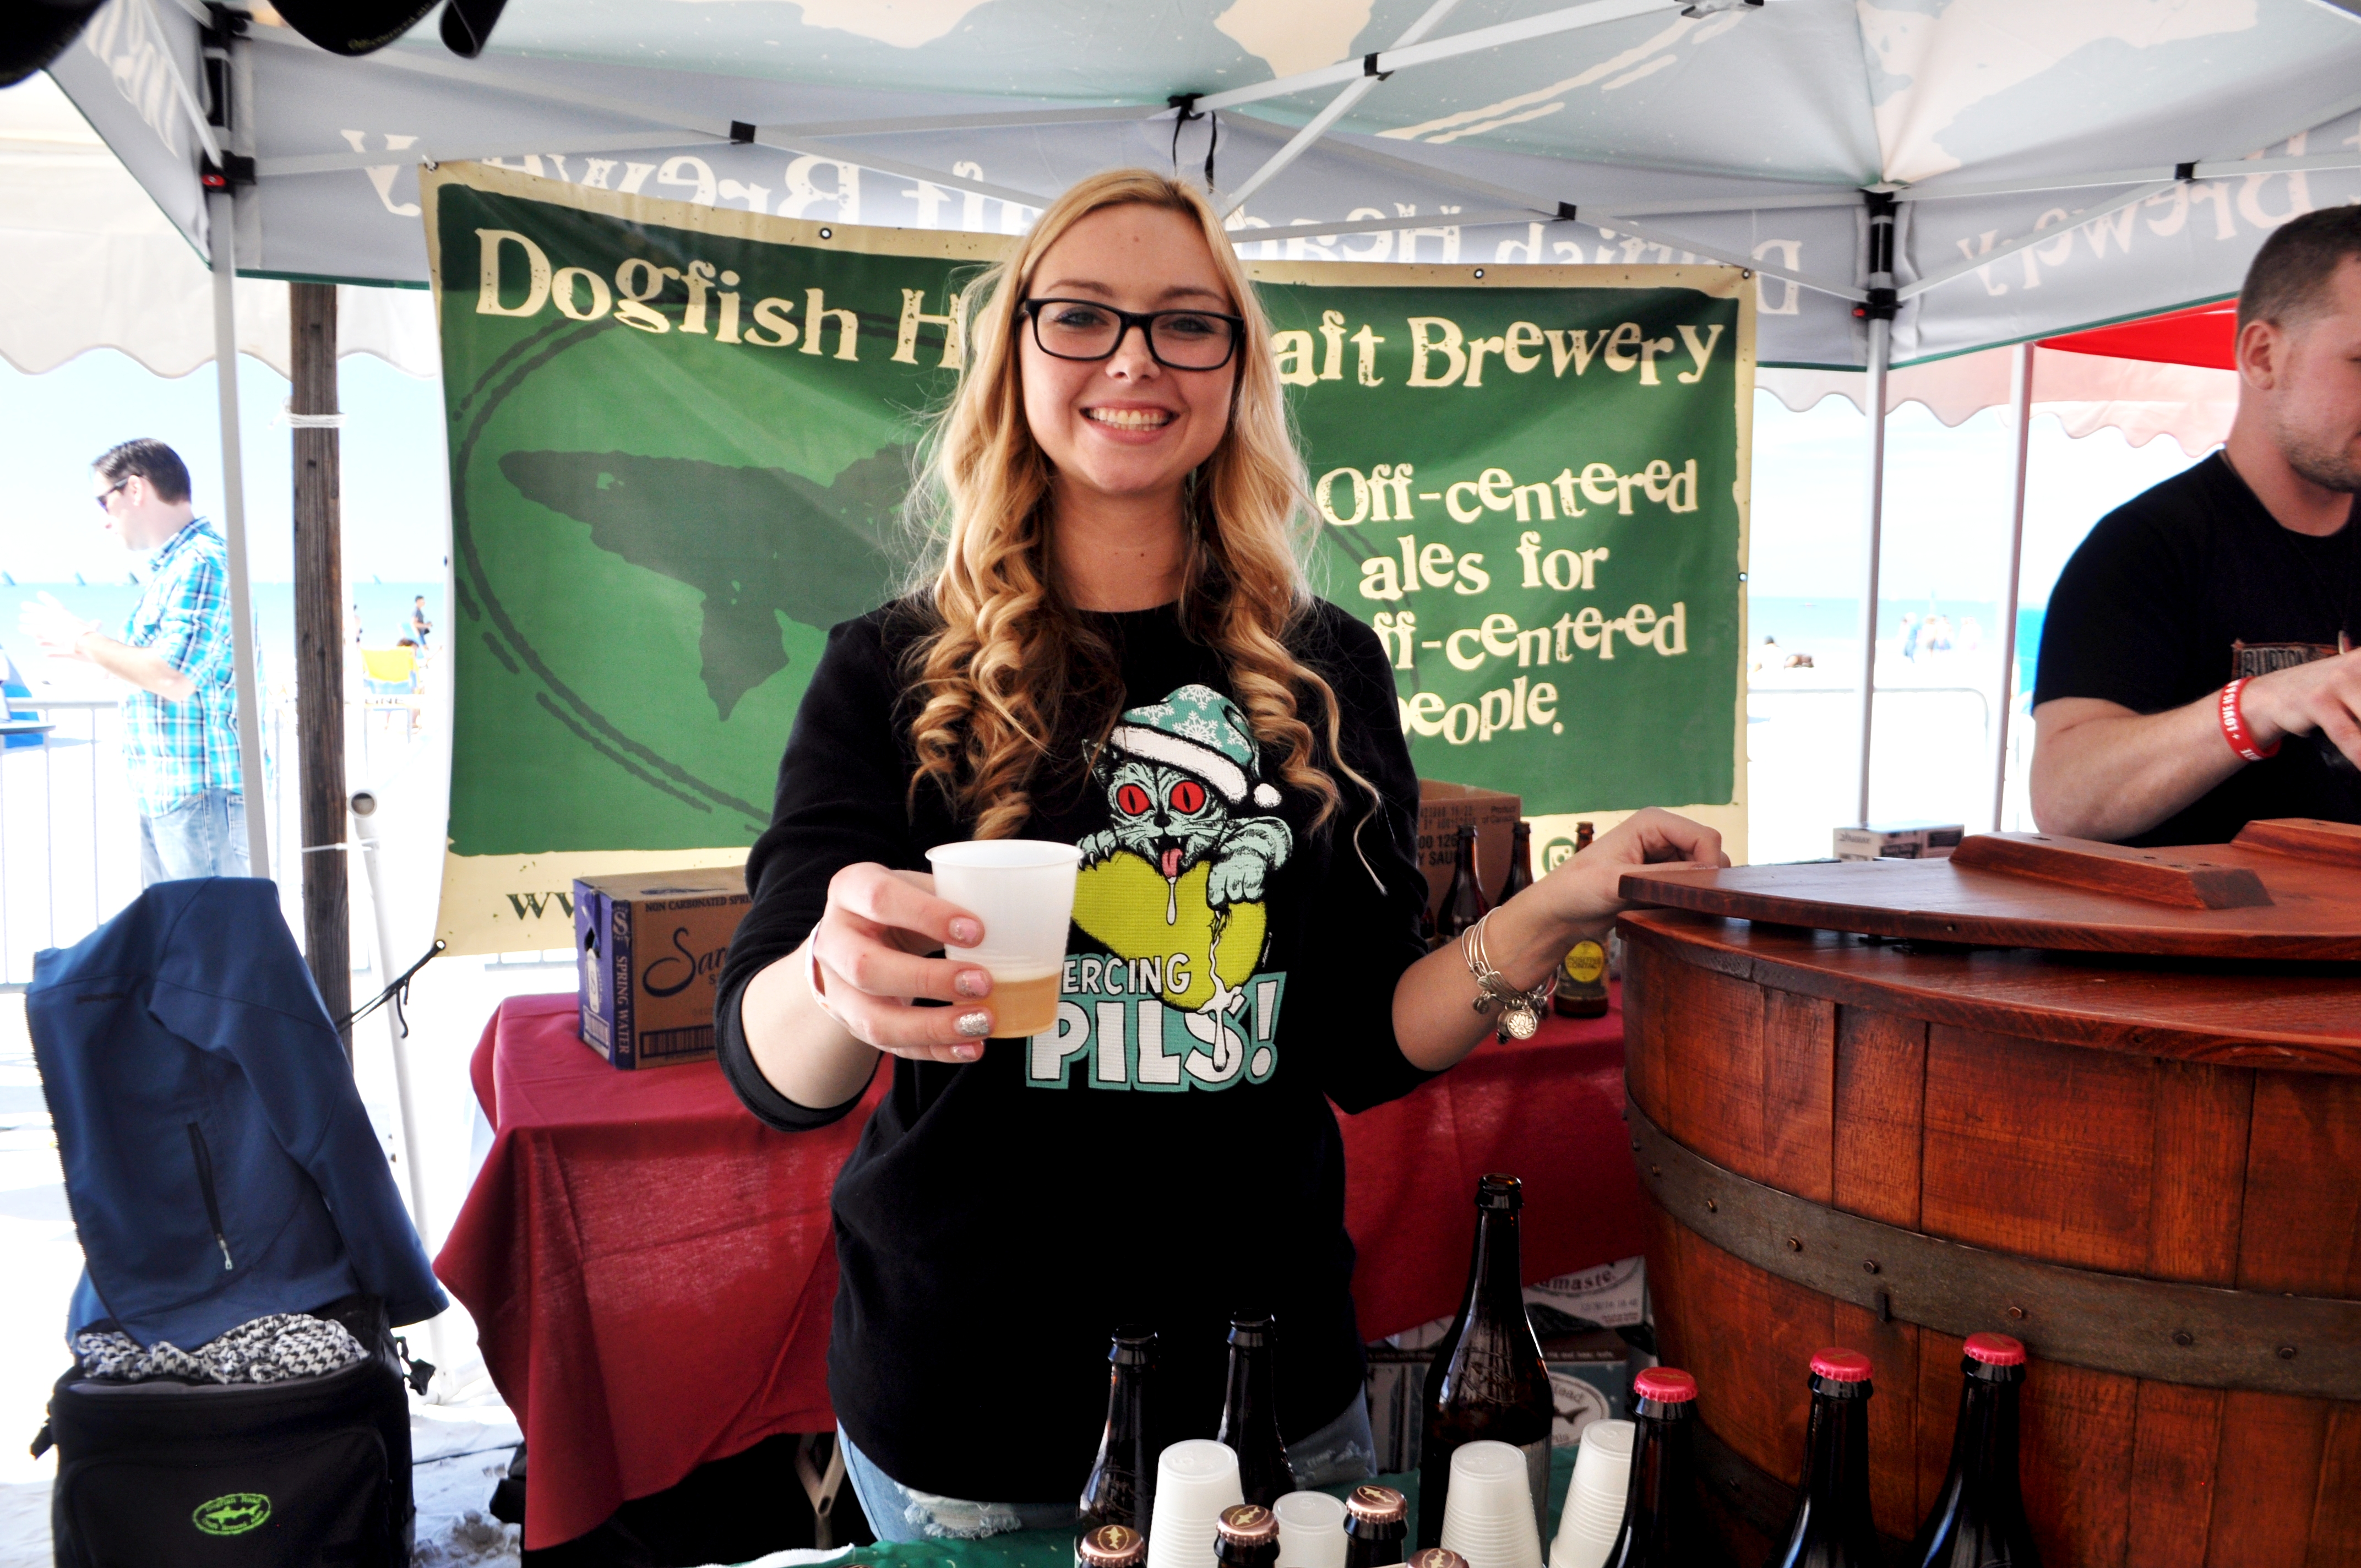 Dogfish Head Beer - Clearwater Beach Uncorked, Food, Wine & Beer Festival. Clearwater Beach, Florida, Feb. 7, 2015